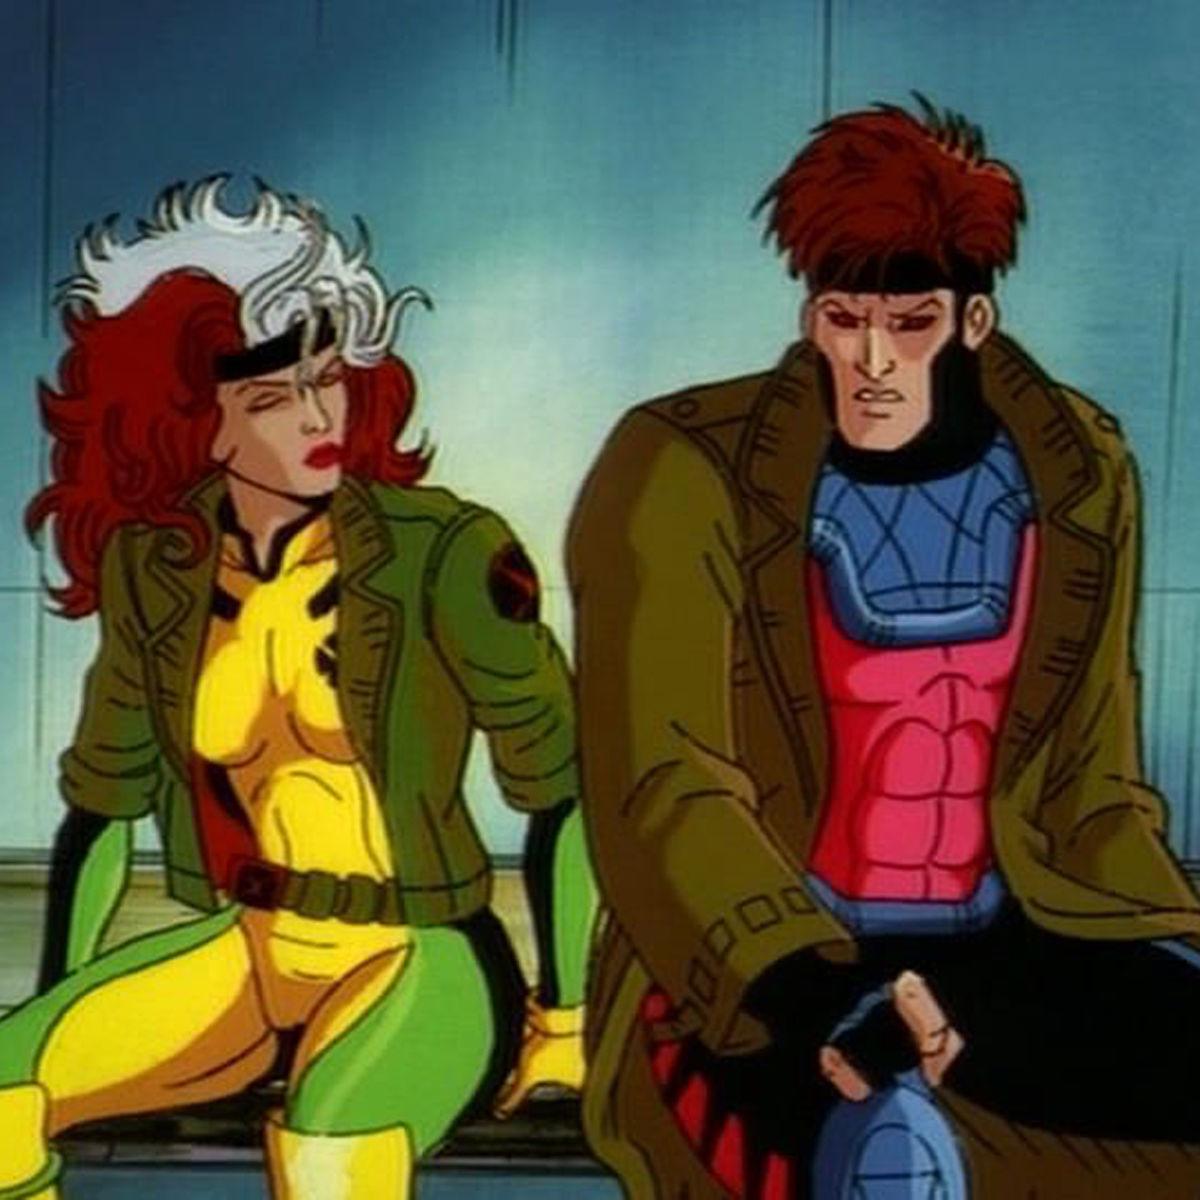 f8786d64774438485f24fdd83592cea9-gambit-cosplay-s-cartoons.jpg